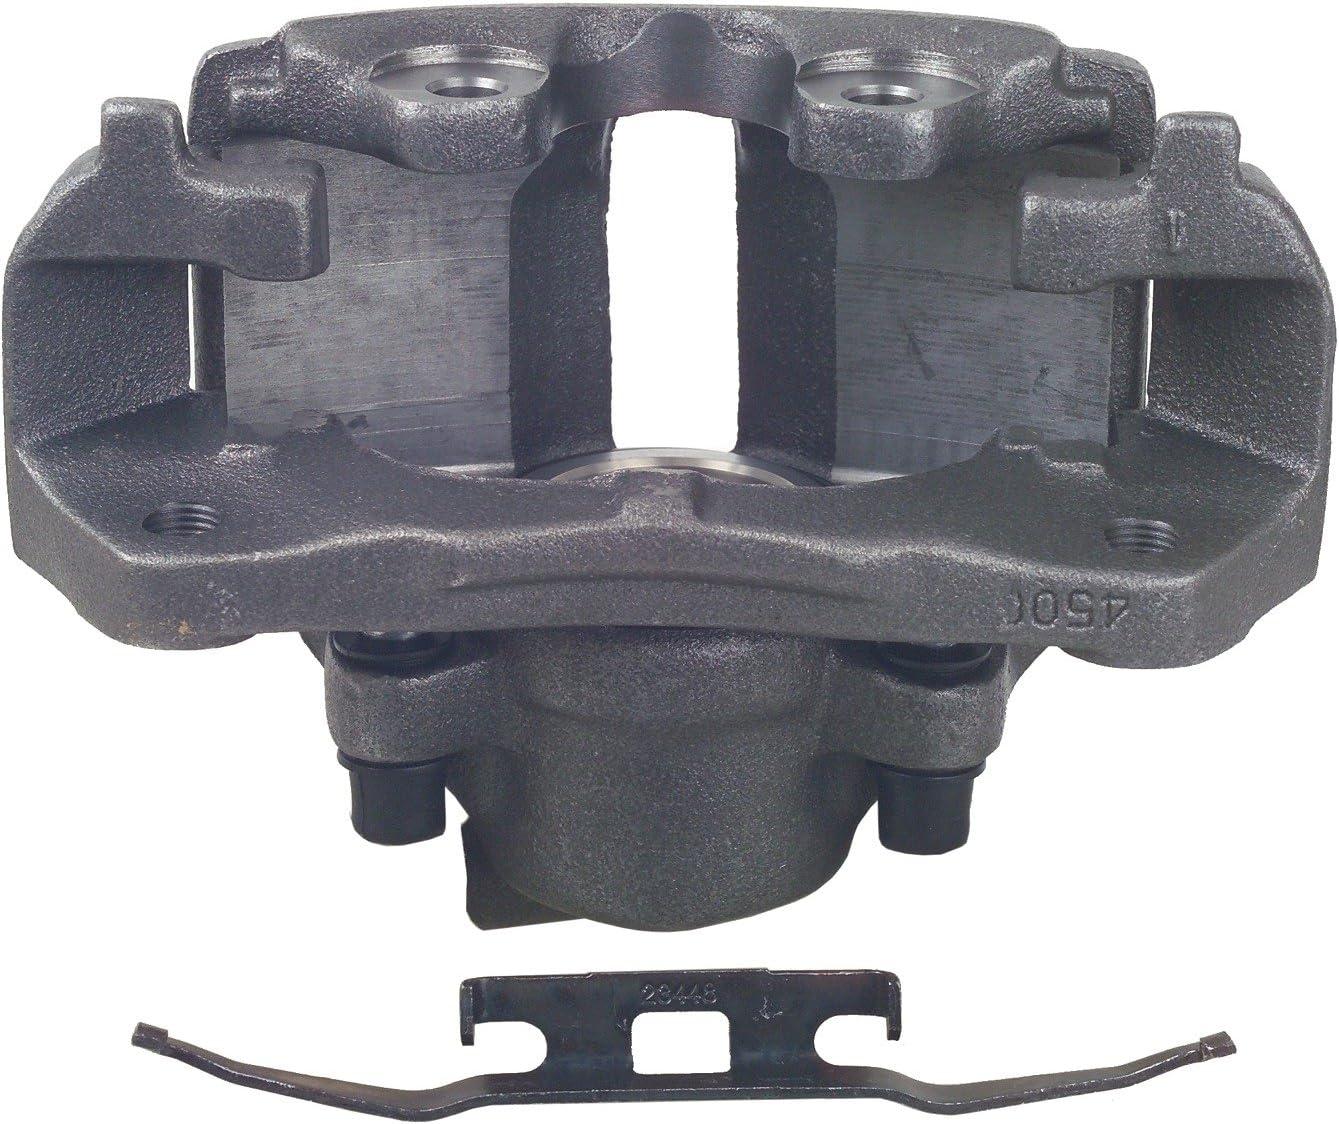 Cardone 18-B4979 Remanufactured Domestic Friction Ready Unloaded Brake Caliper A1 Cardone